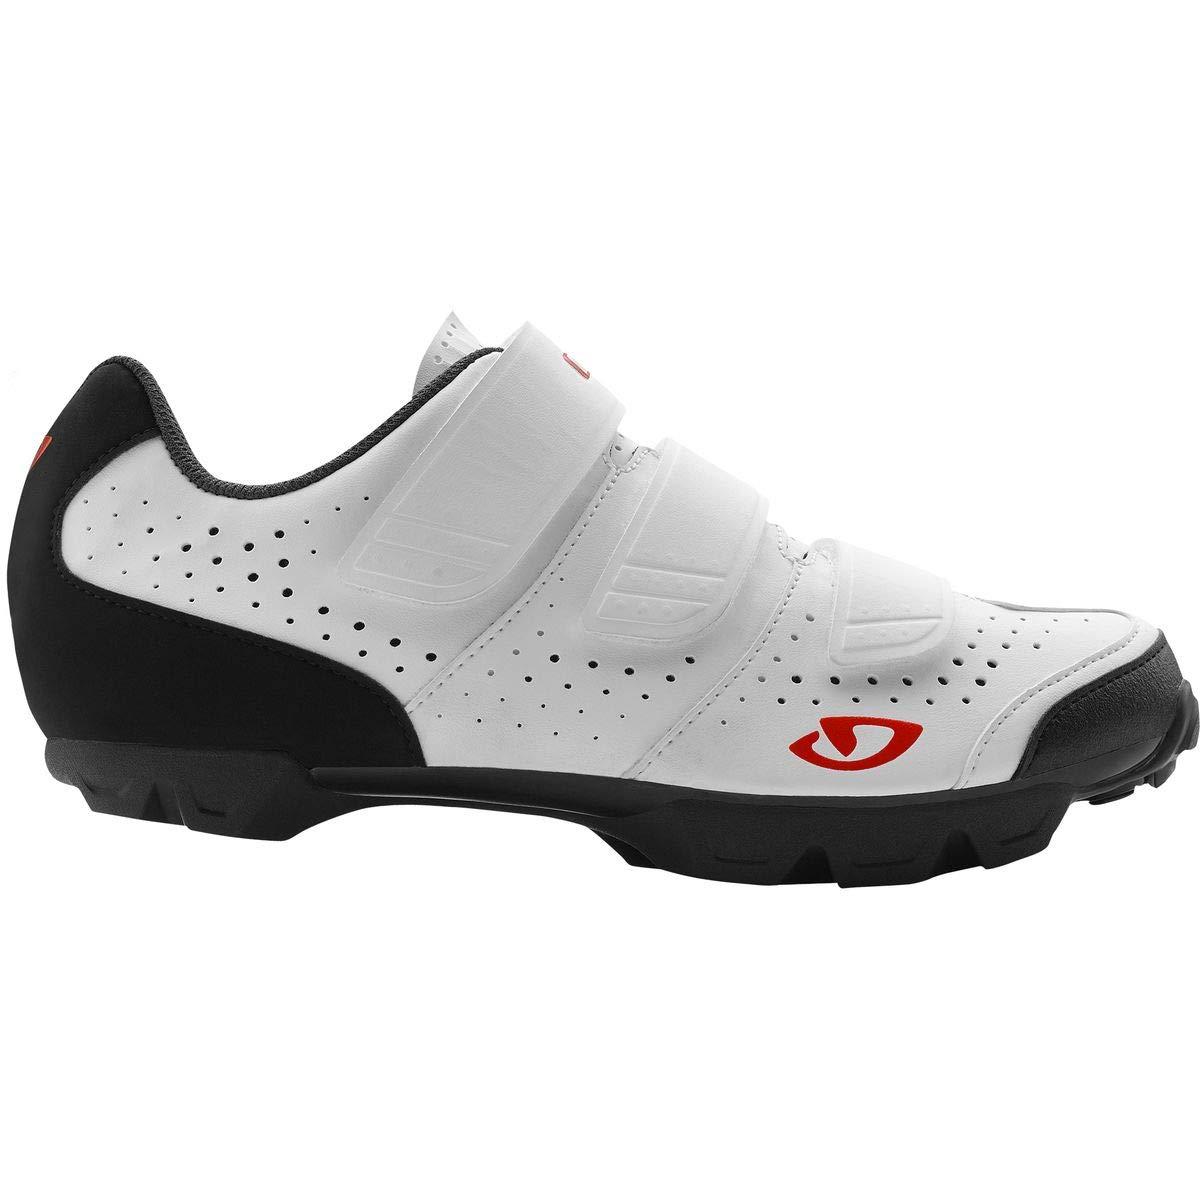 Giro Riela R Womens MTB Shoes White/Coral 36 by Giro (Image #1)